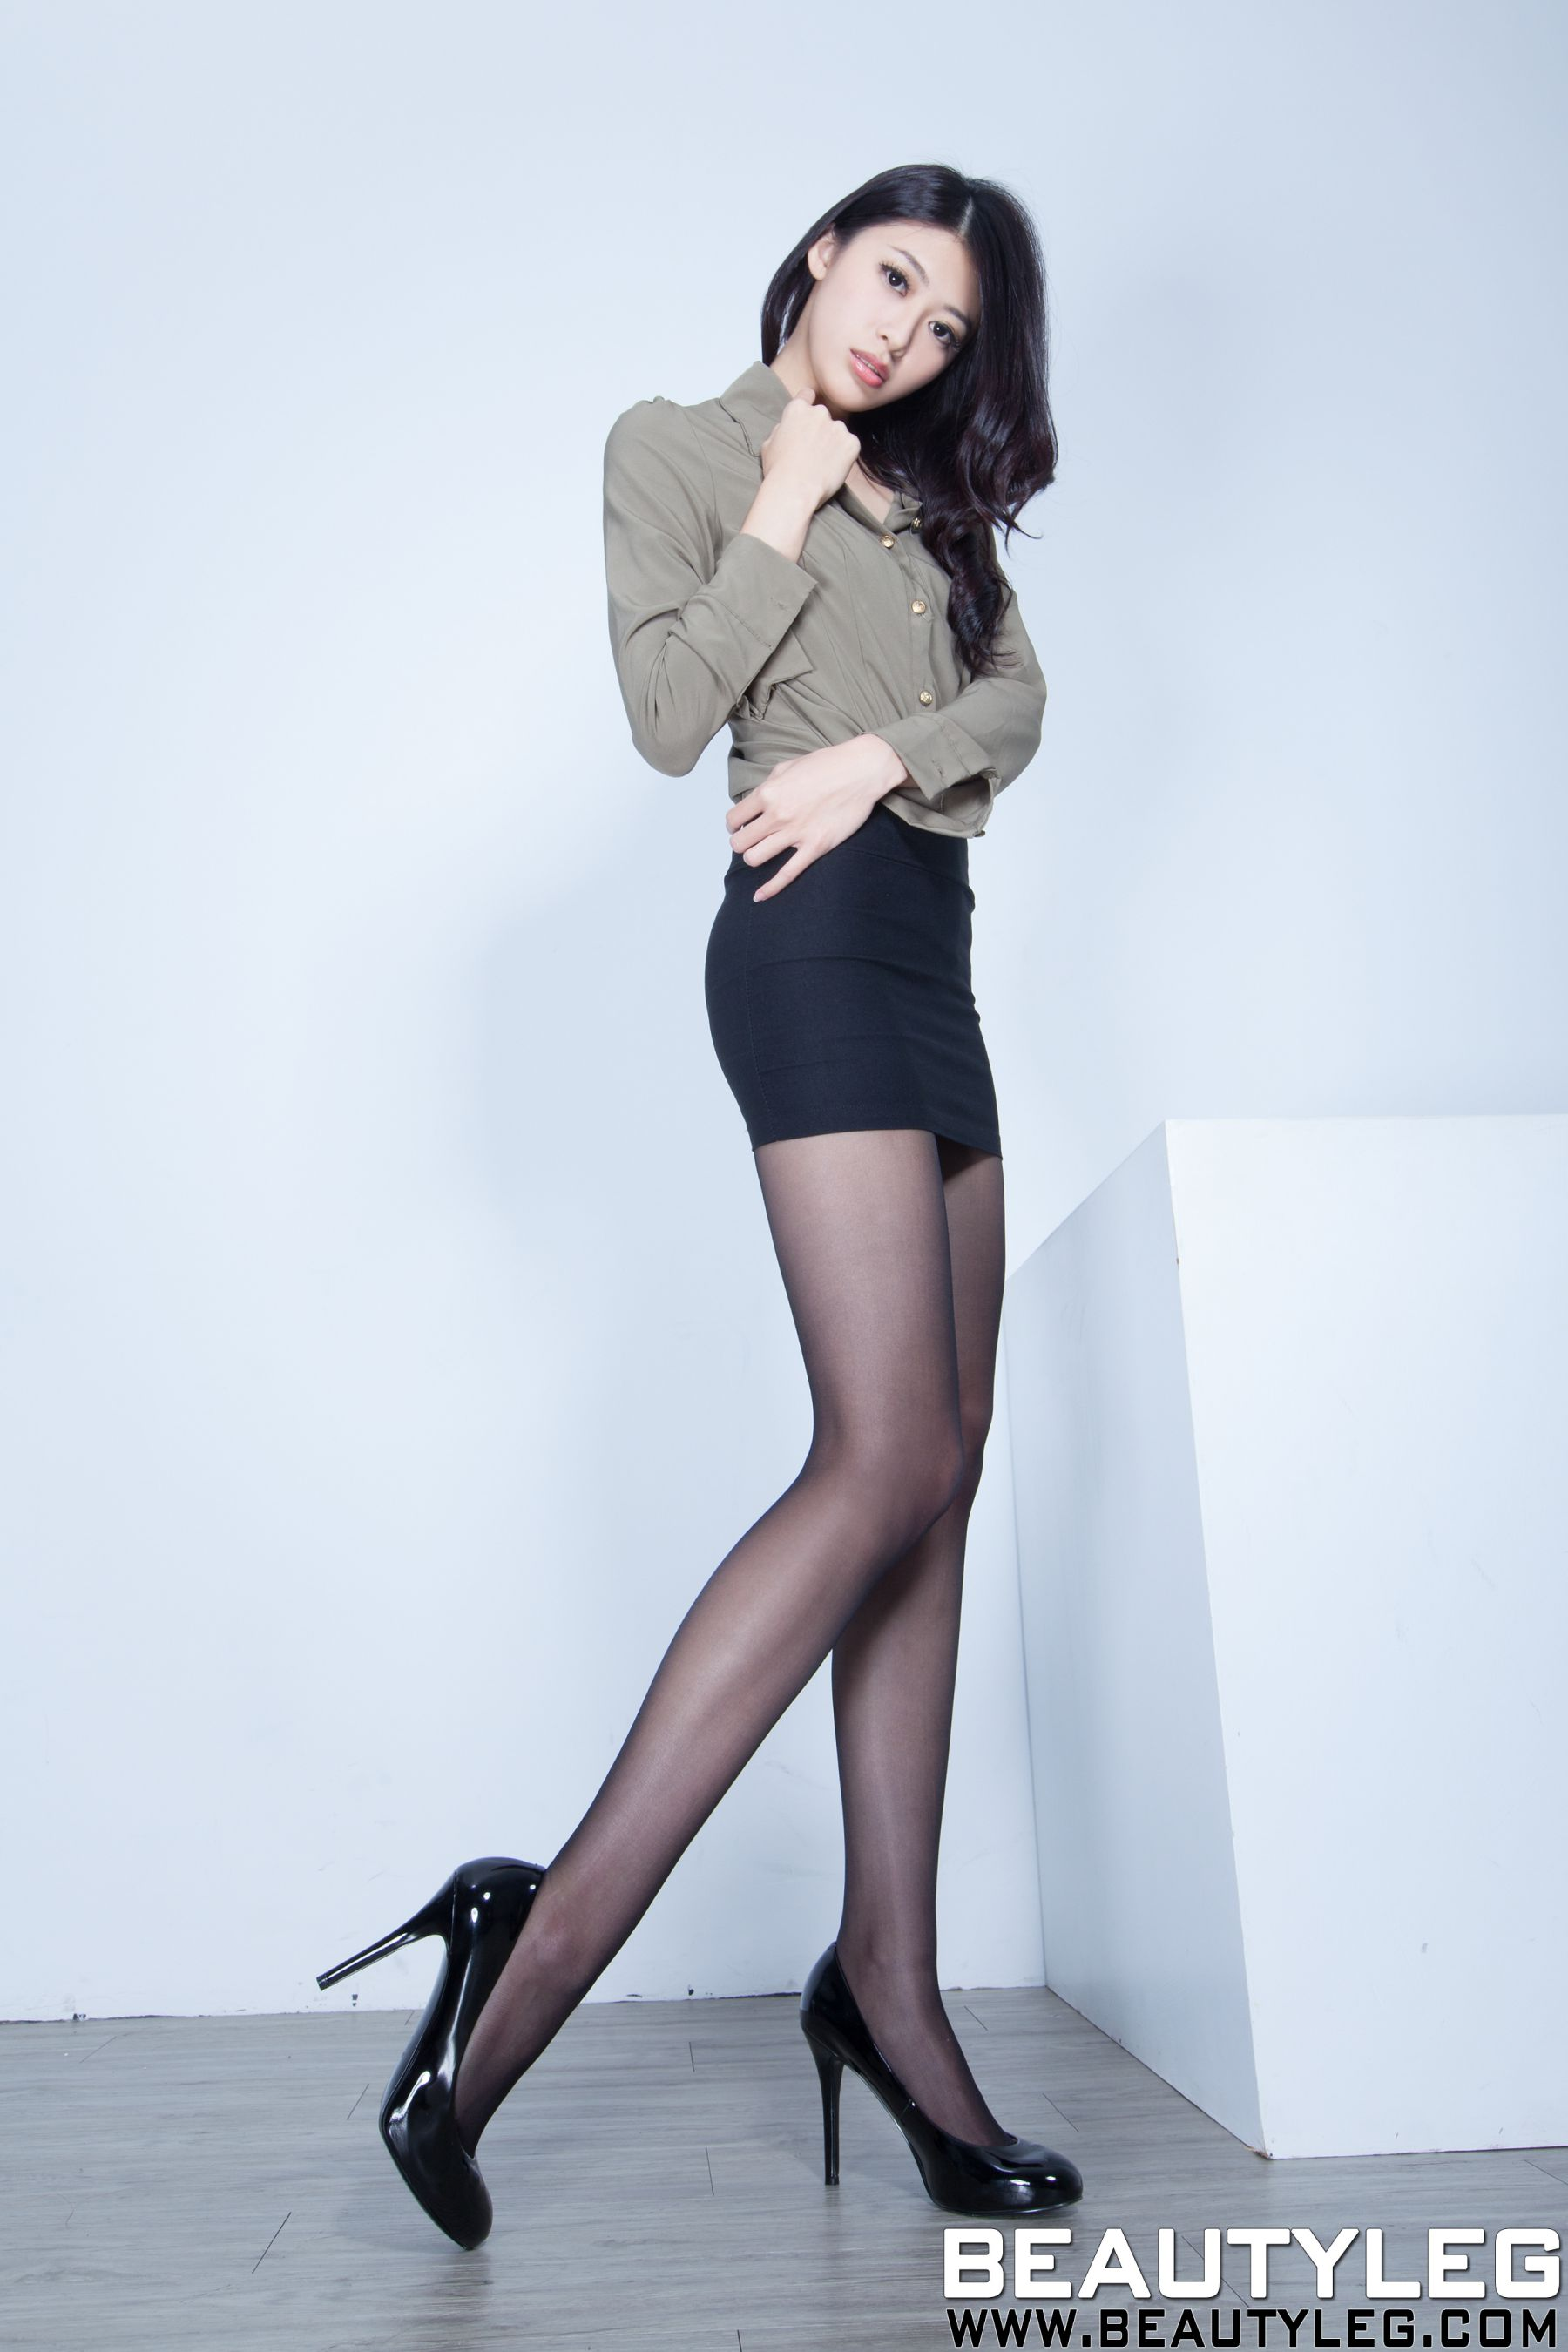 VOL.1361 [Beautyleg]高跟凉鞋长腿美女:蔡茵茵(腿模Flora)高品质写真套图(53P)